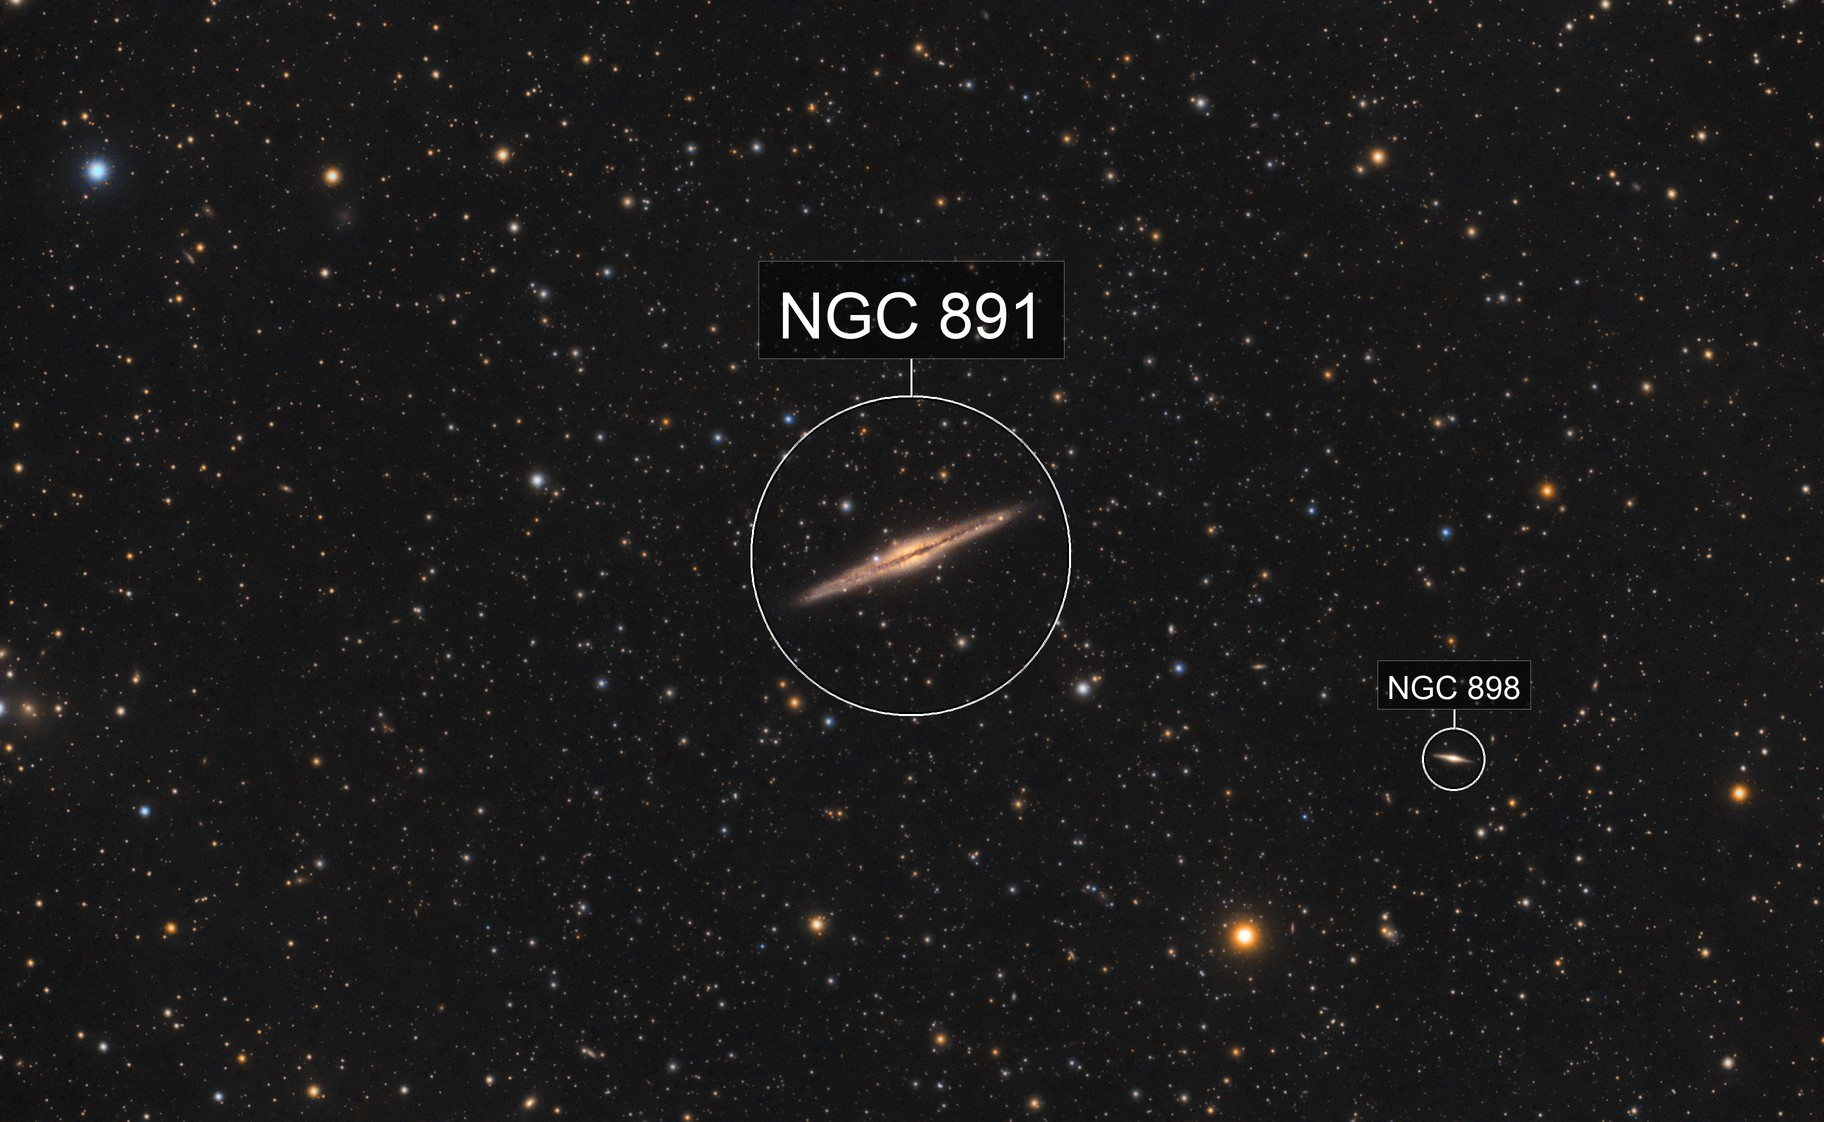 Silver Sliver - NGC 891